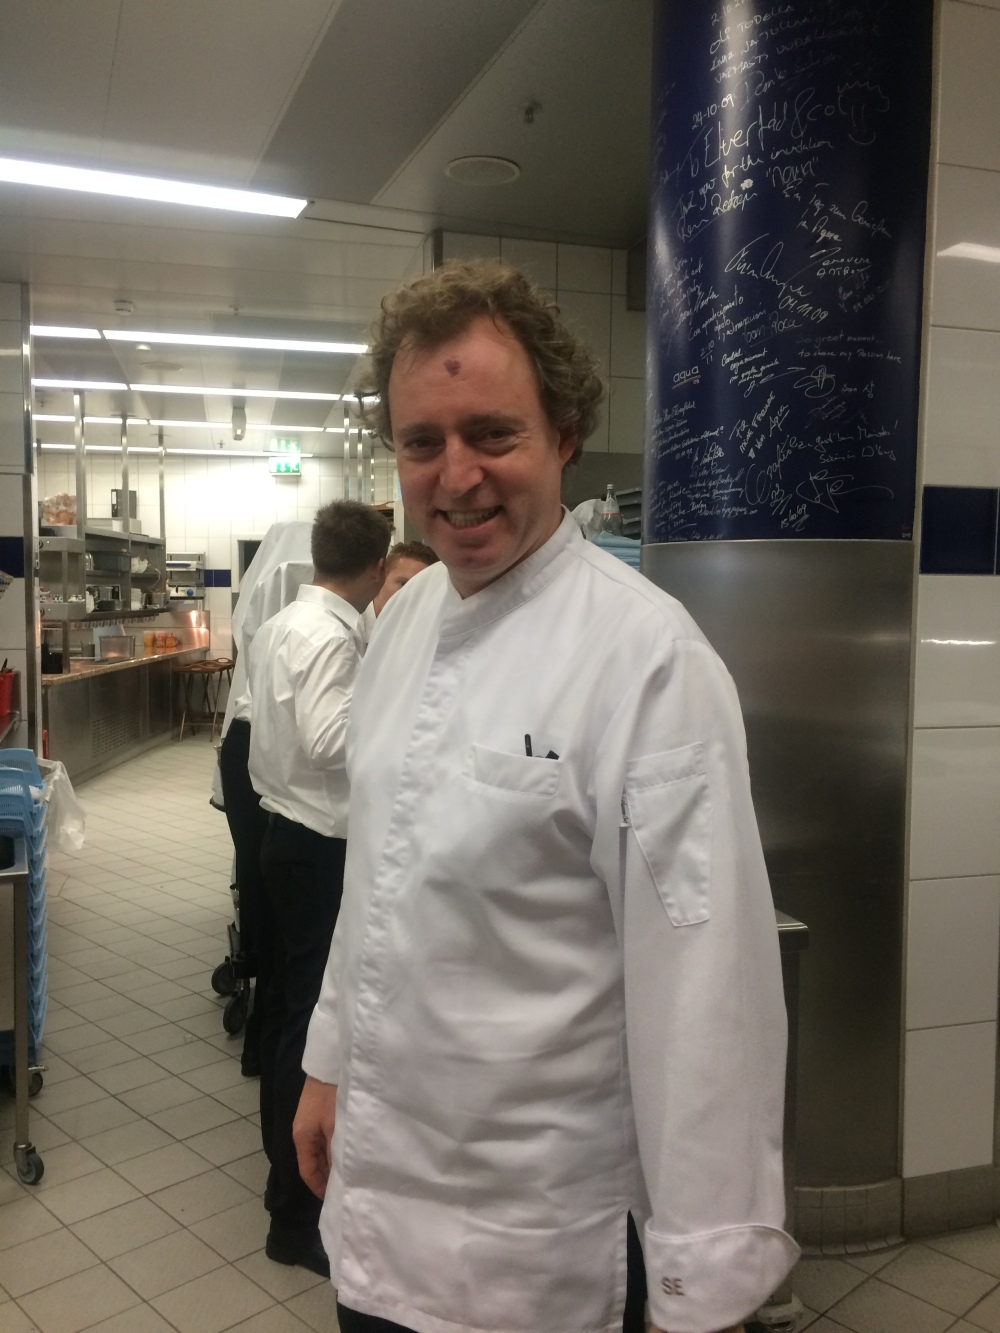 Chef Elverfeld in the kitchen at Aqua